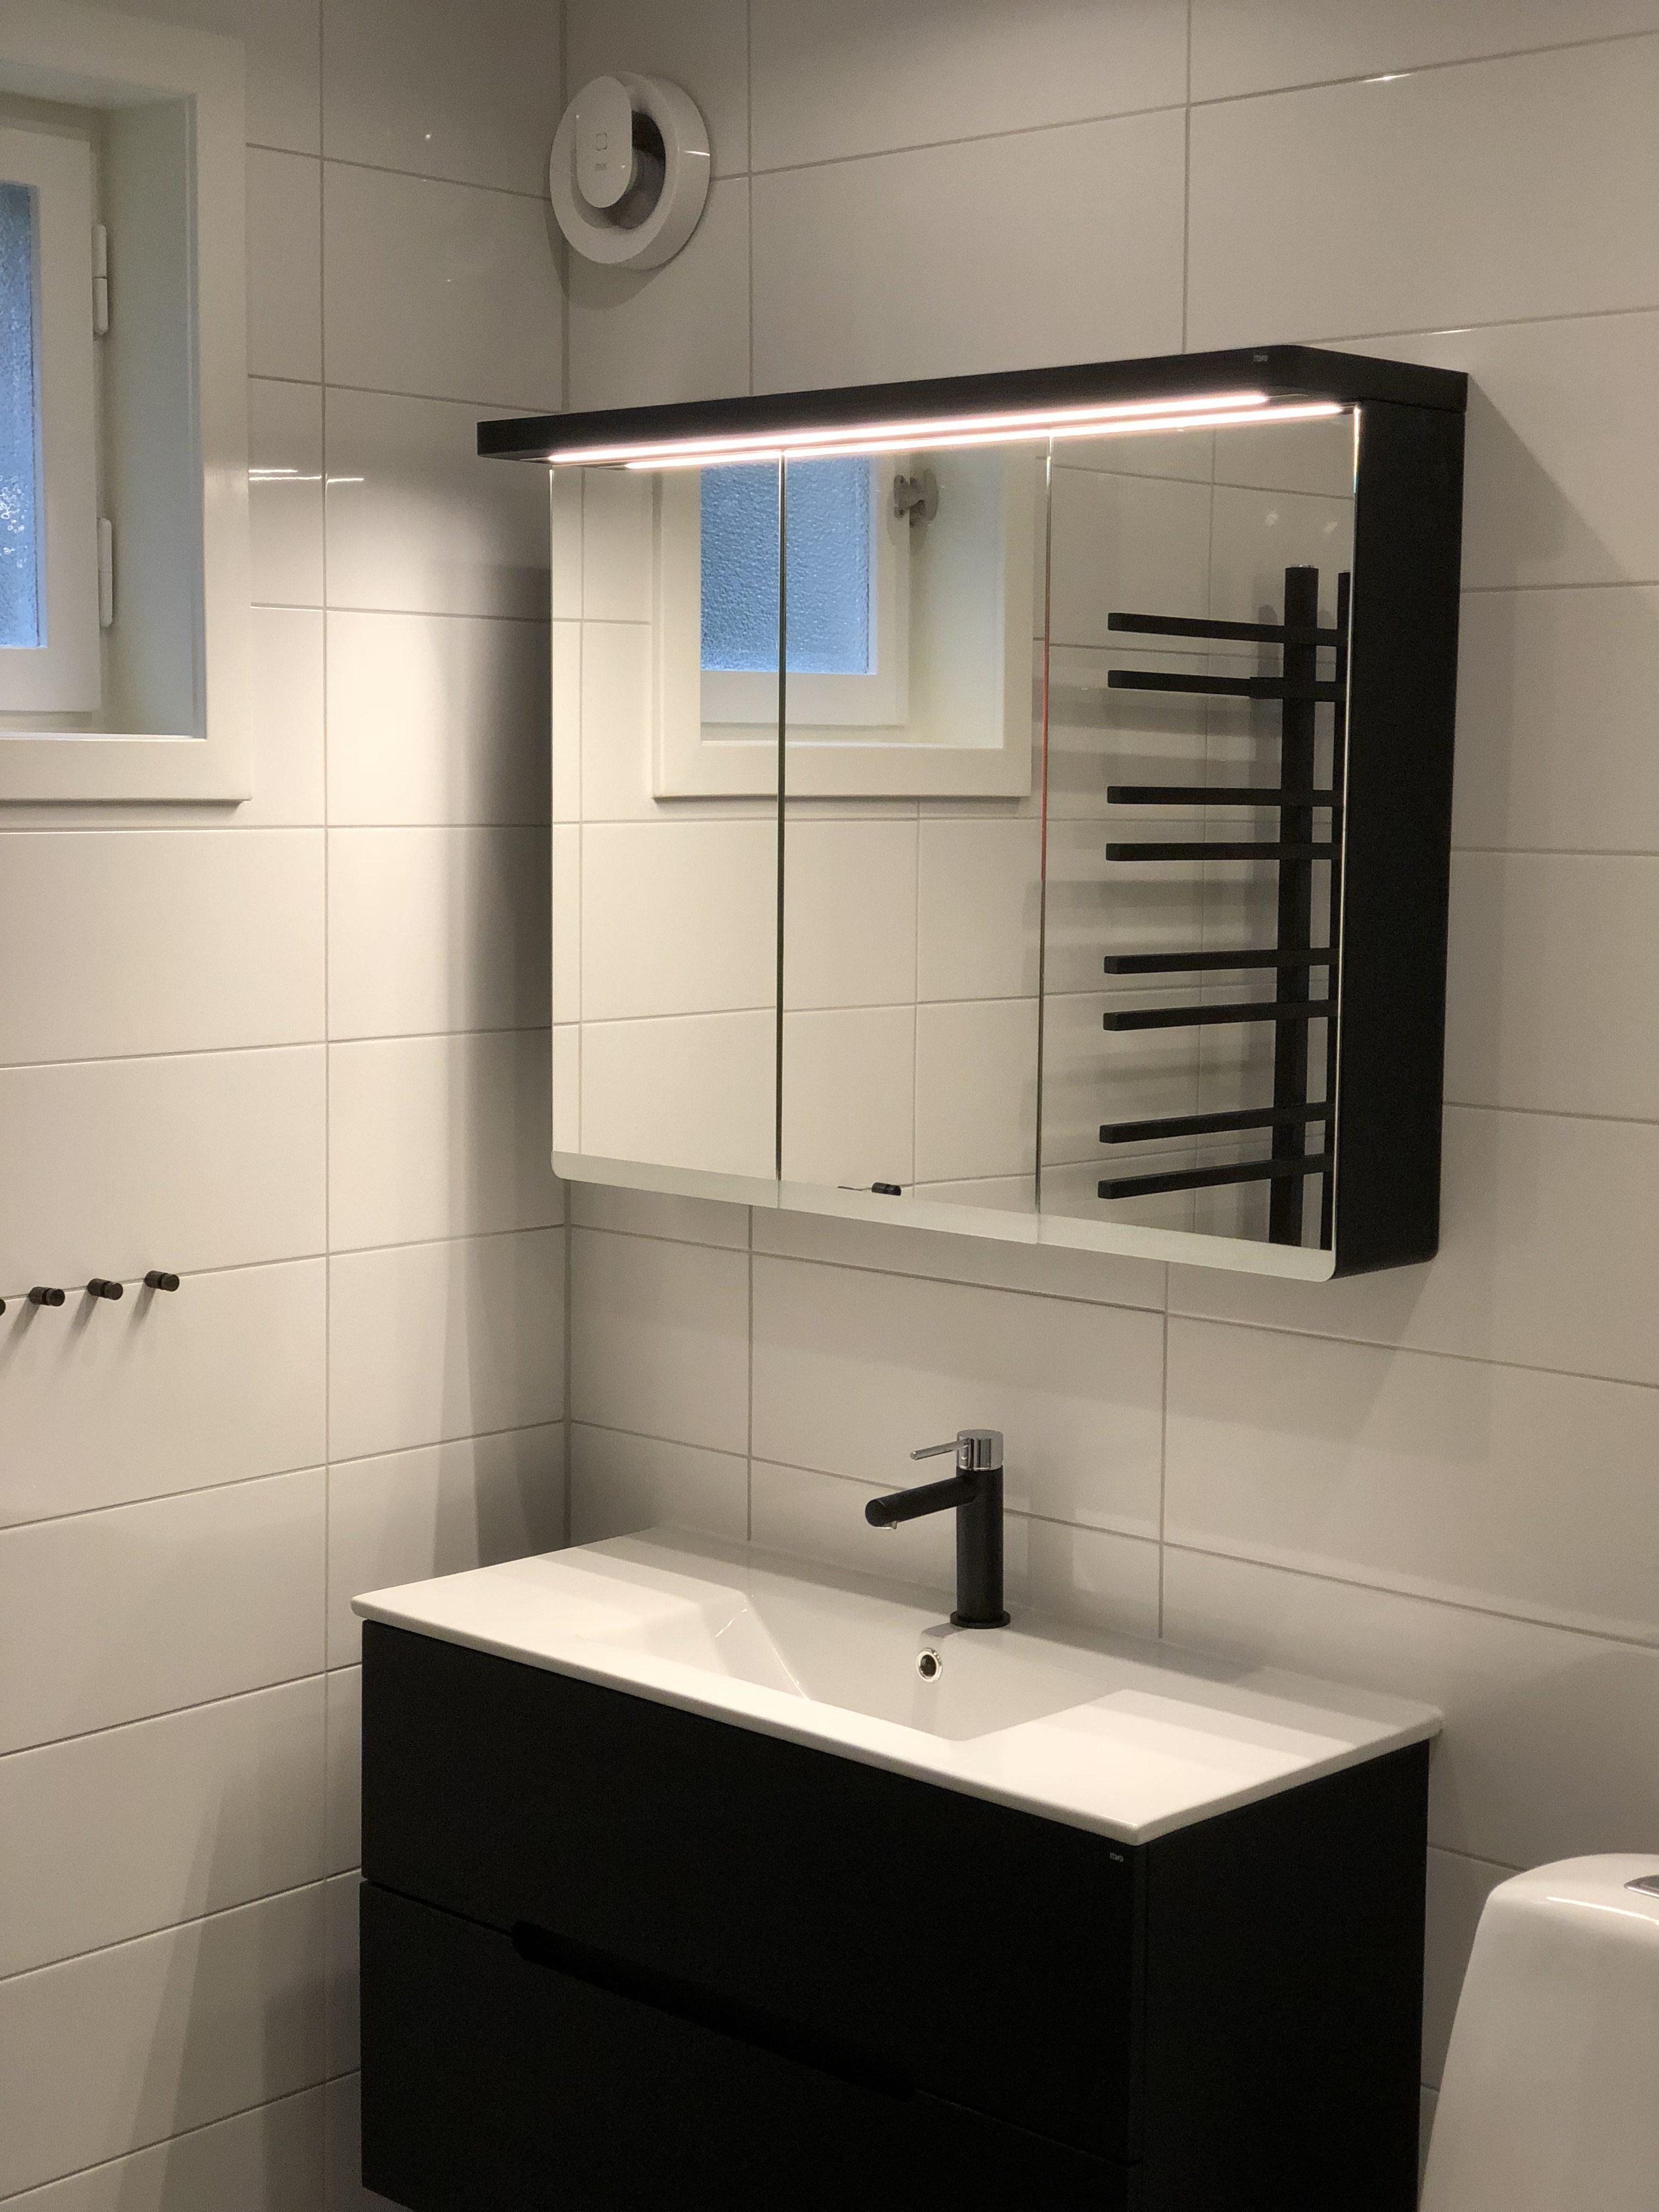 Badrum, spegel, handfat, handdukstork